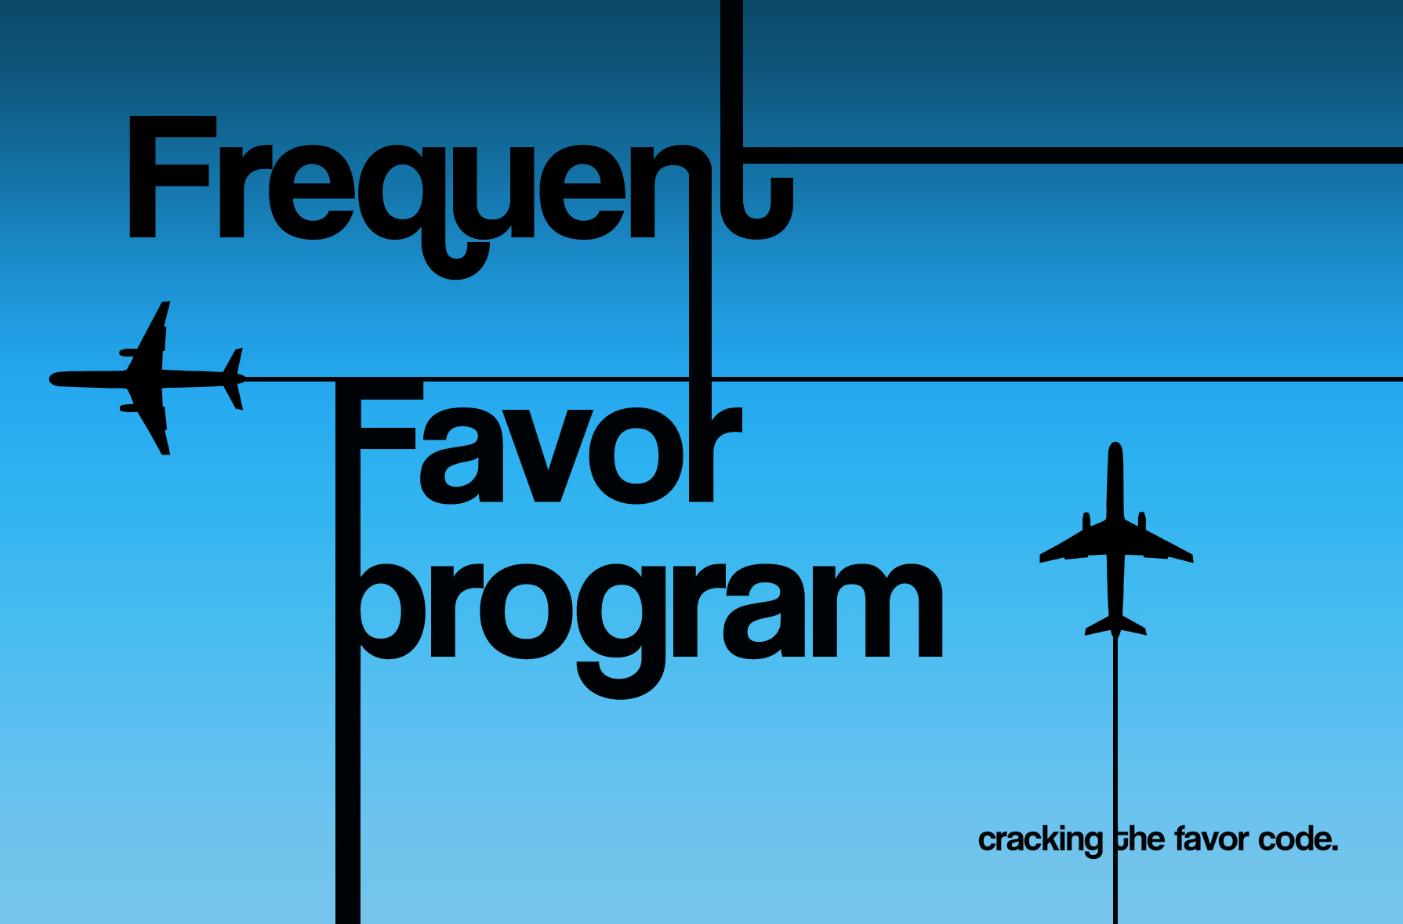 Design - Favor